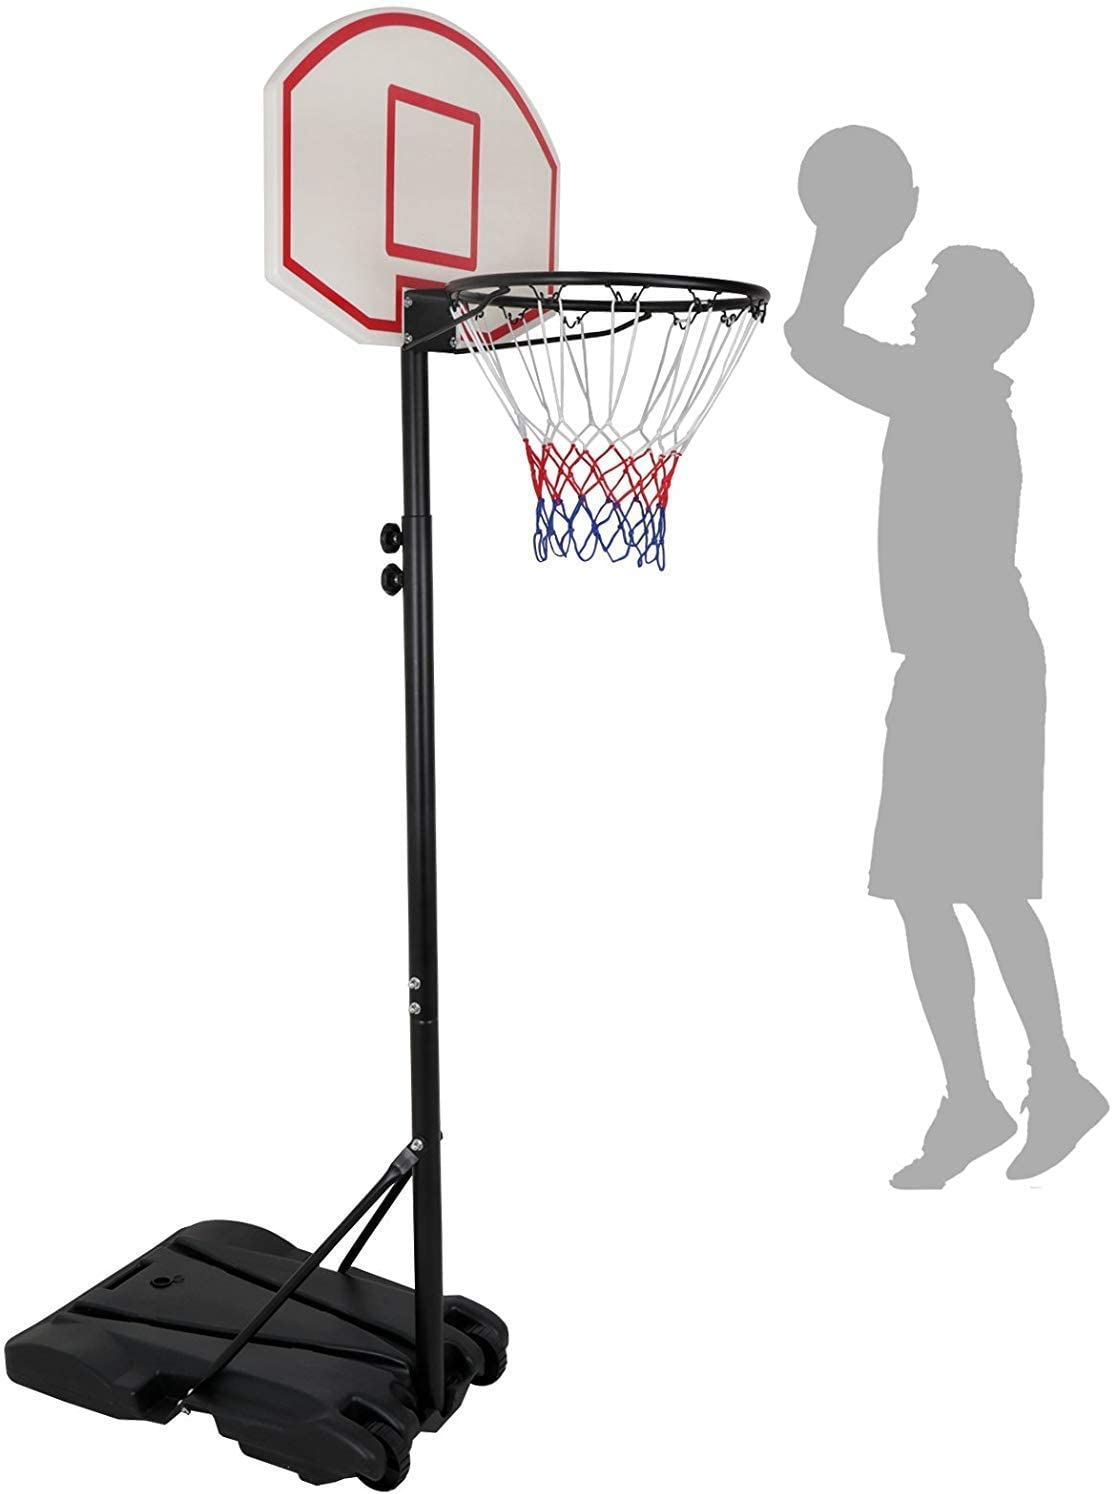 HomGarden Mini Portable Basketball Hoop Stand for Kids Juniors 8 ft Adjustable Height Backboard Starter Basketball System w/Wheels Indoor Outdoor